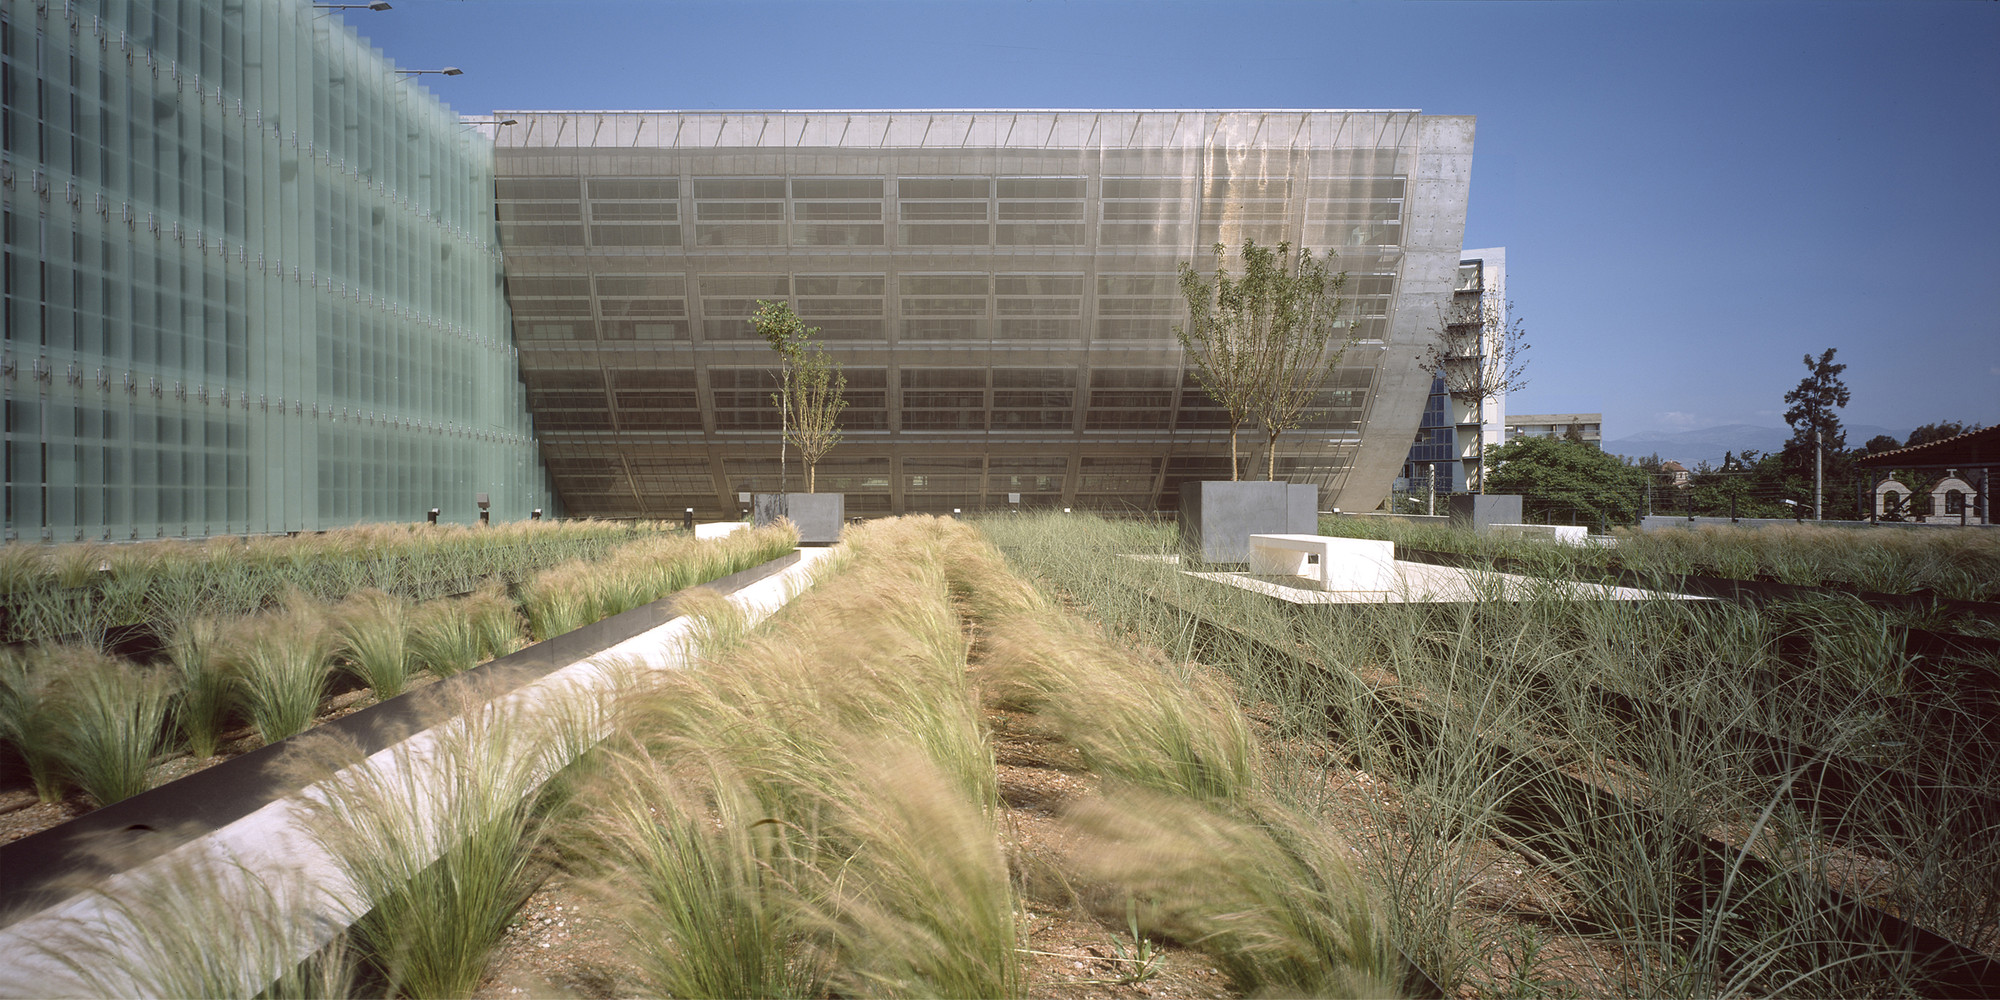 Shop & Trade / Kokkinou-Kourkoulas Architects, Courtesy of Kokkinou-Kourkoulas Architects